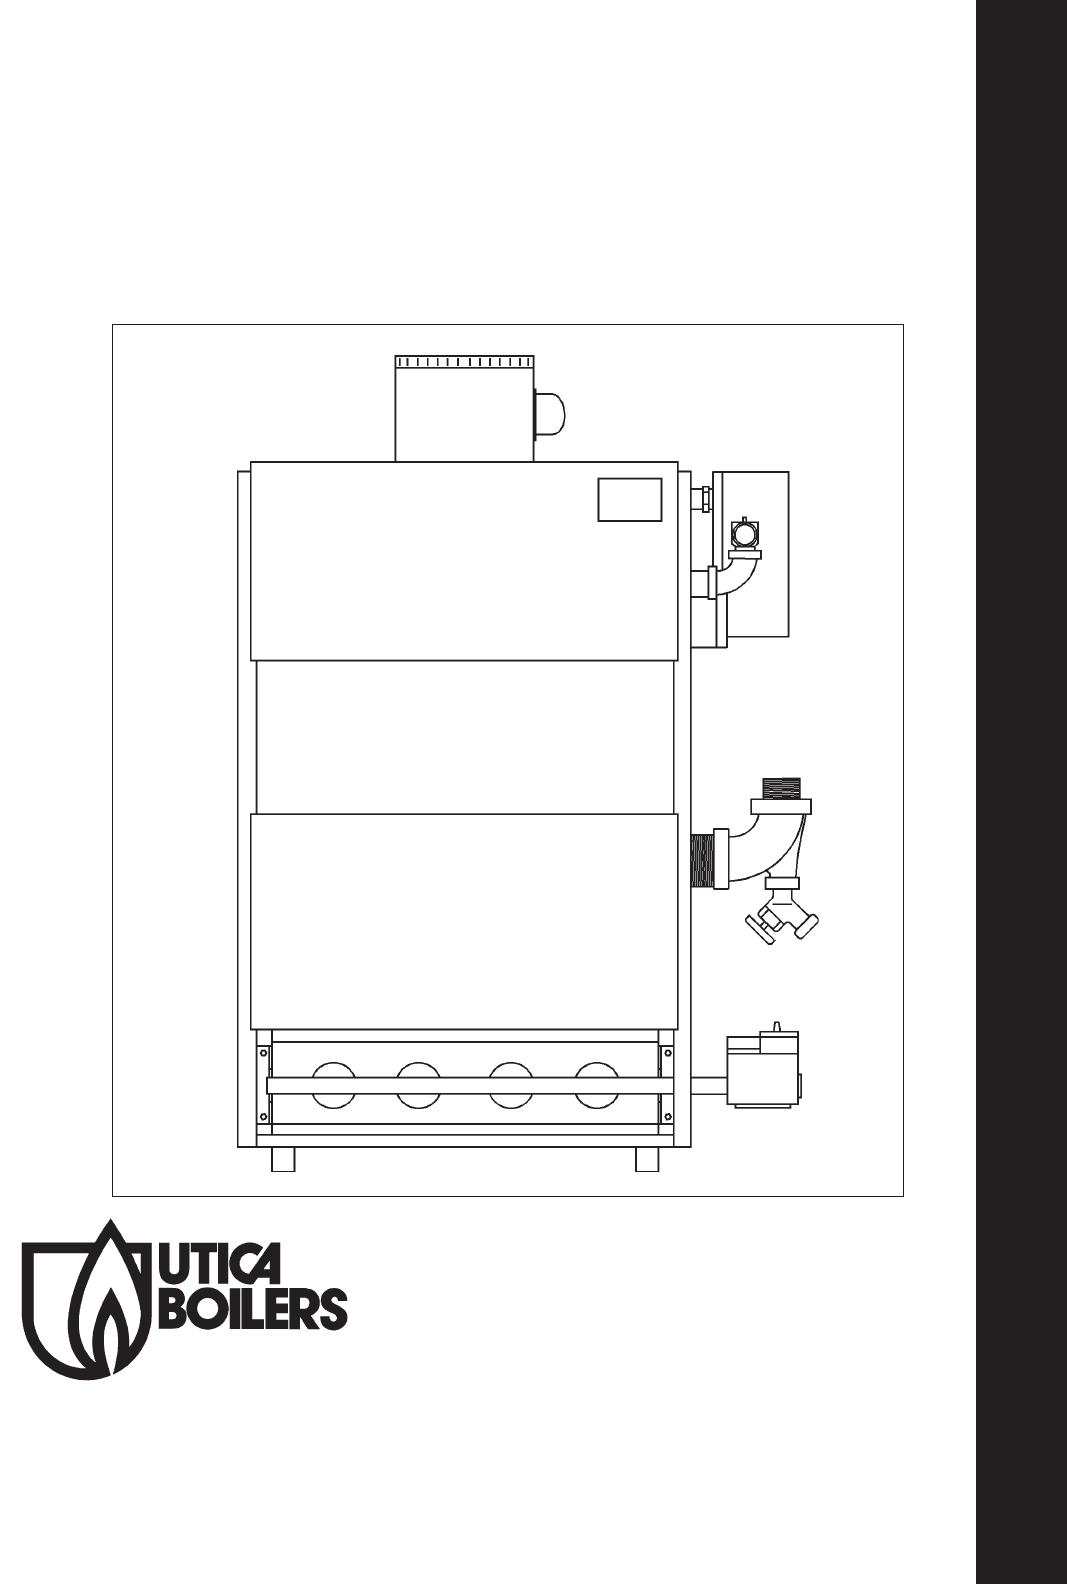 utica gas fired boiler operation manual manualslib makes it easy to Utica Boiler System